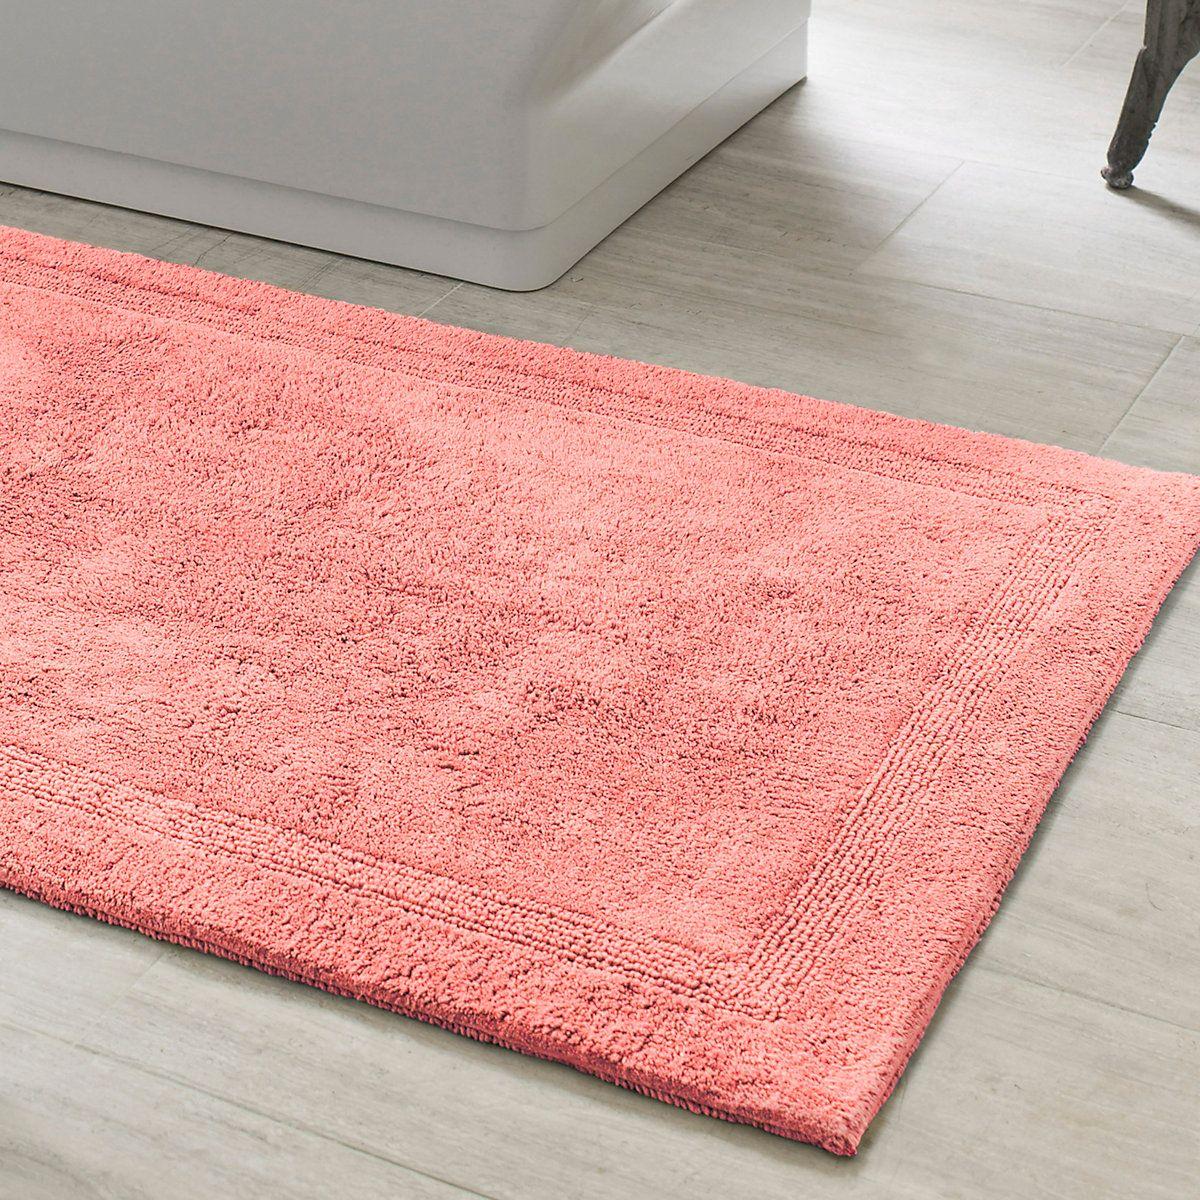 signature coral bath rug | bath rugs, coastal and bath